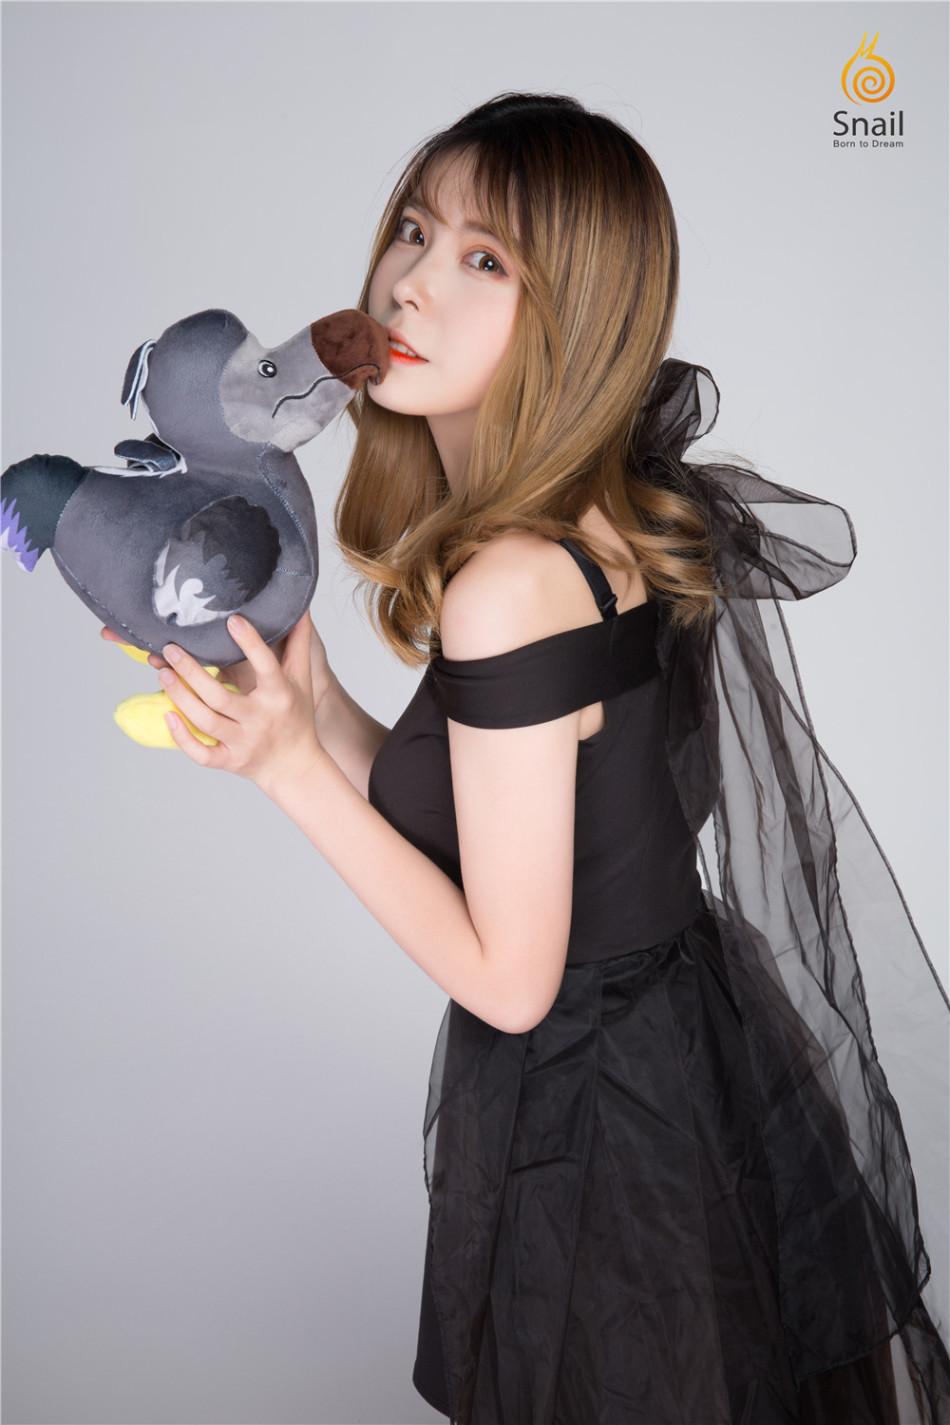 2017CJ蝸牛數字展臺showgirl大起底